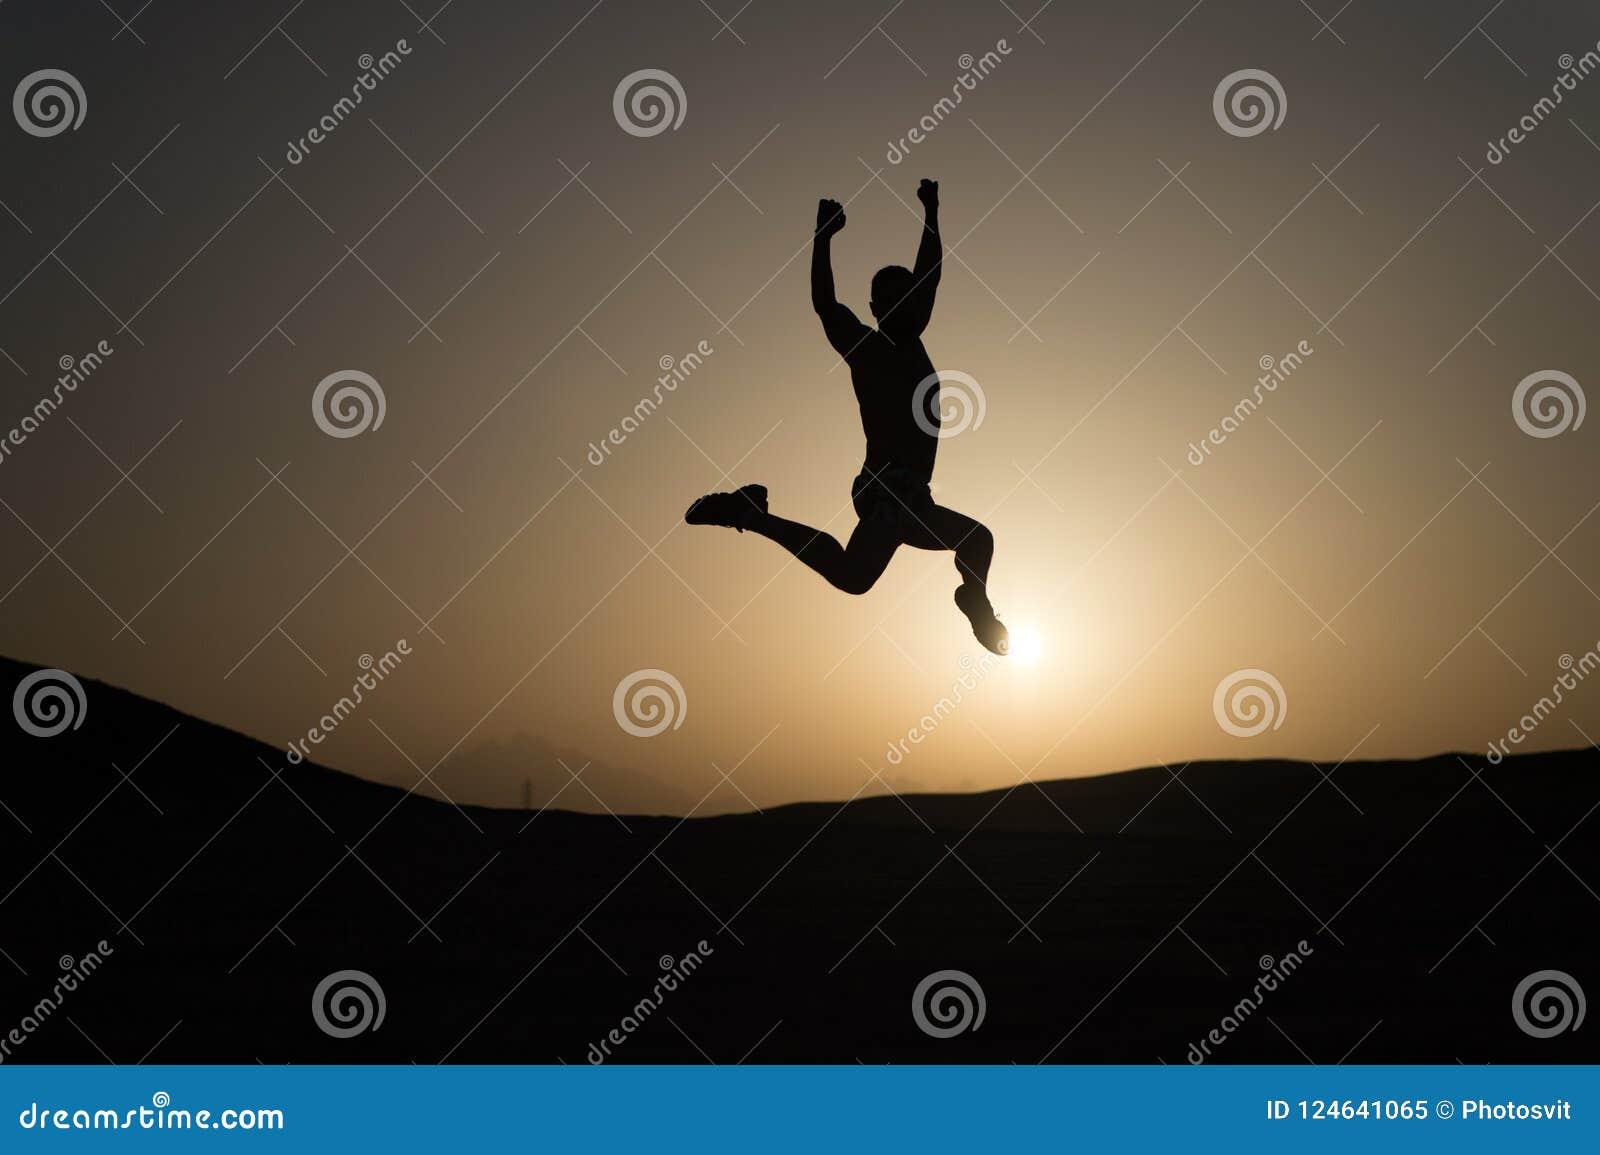 Keep移动 剪影人在日落天空背景前面的行动跃迁 每日刺激 个人健康的生活方式